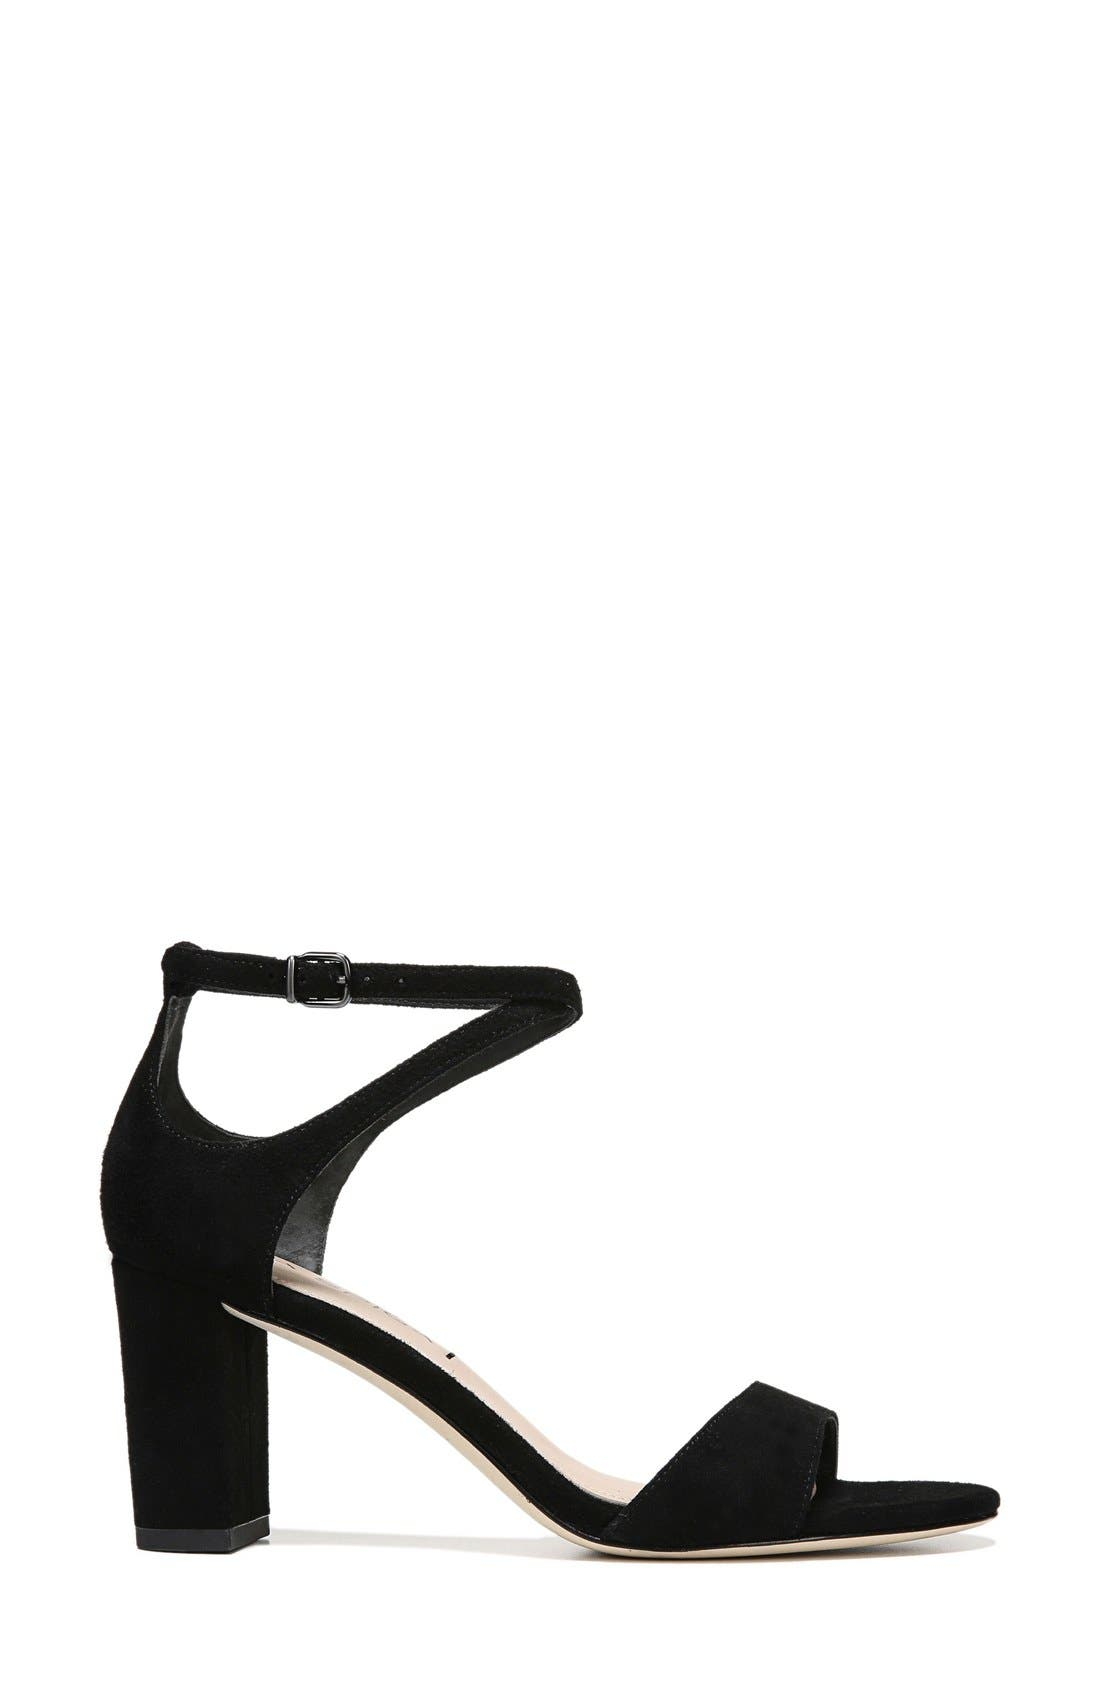 Wendi Ankle Strap Sandal,                             Alternate thumbnail 4, color,                             001